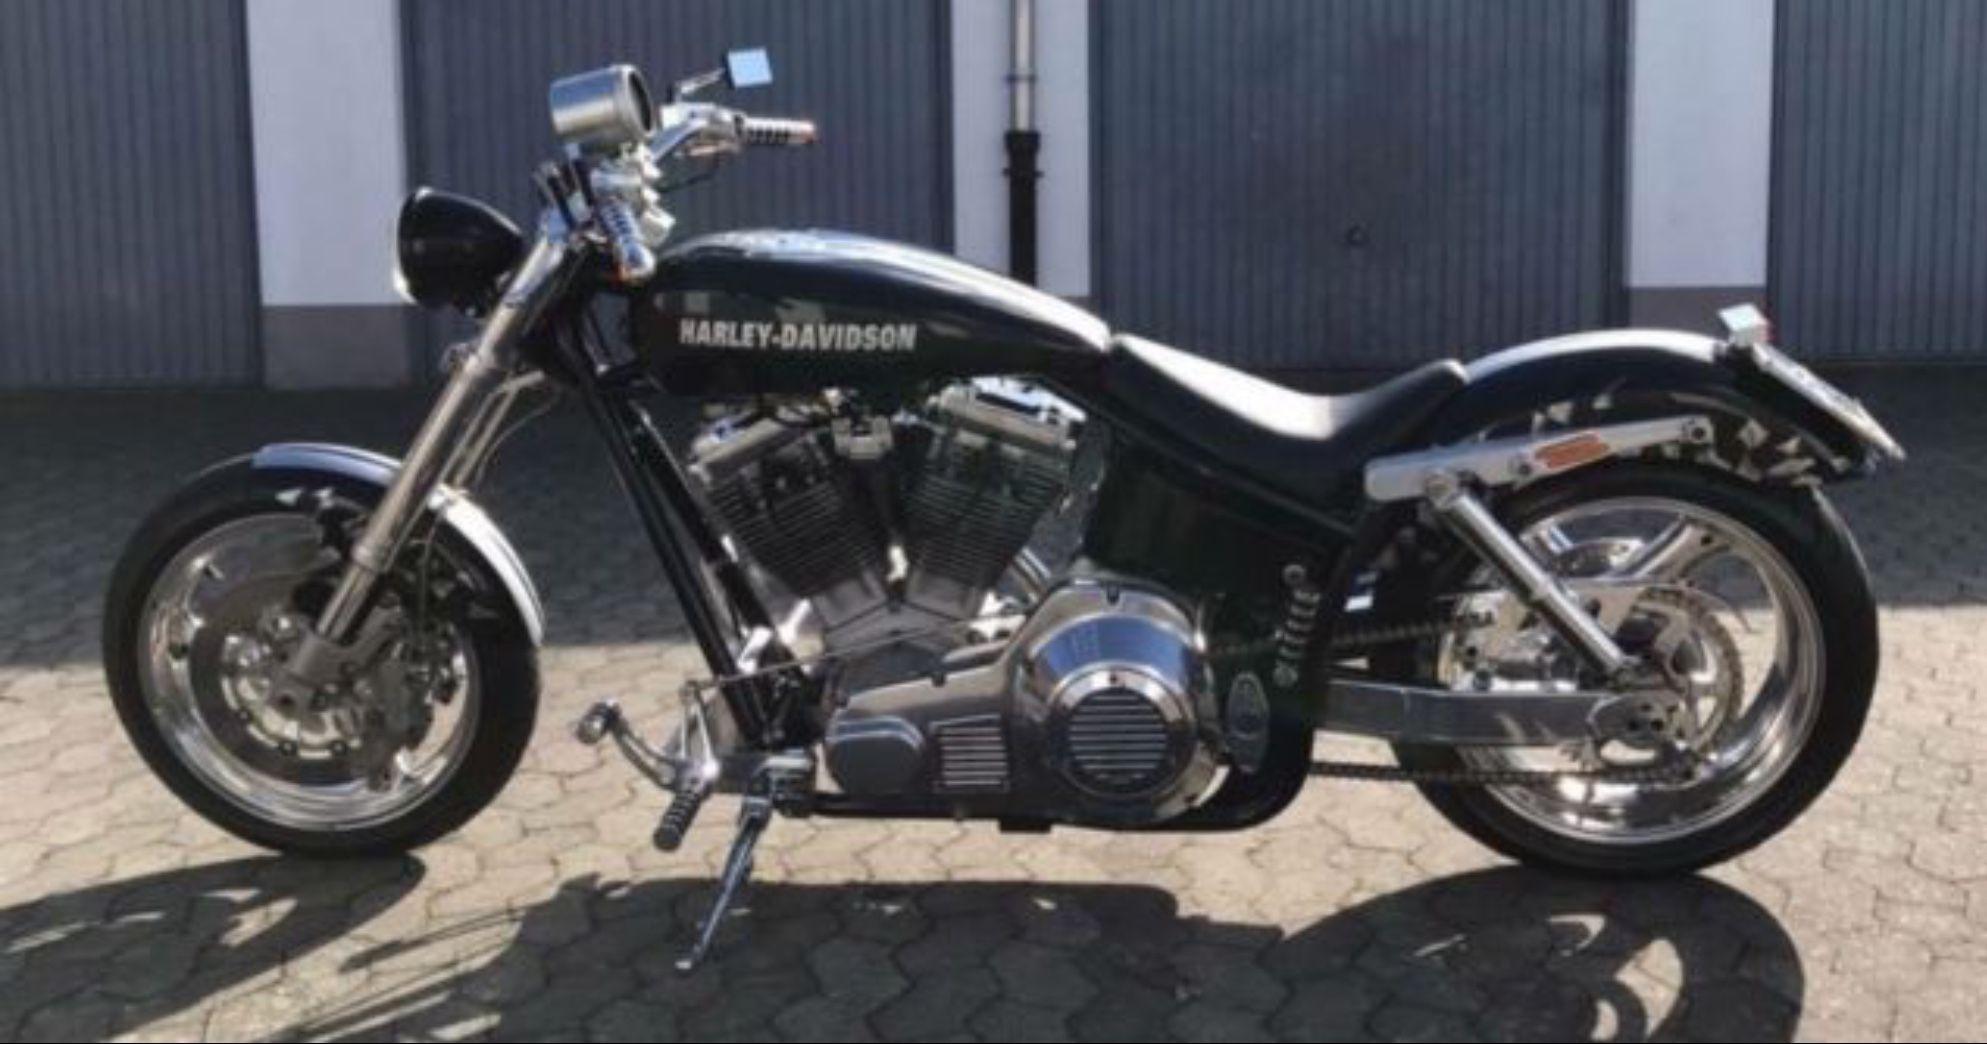 Kenny Boyce Harley Davidson FXR Pro Street Fournales JMC S&S